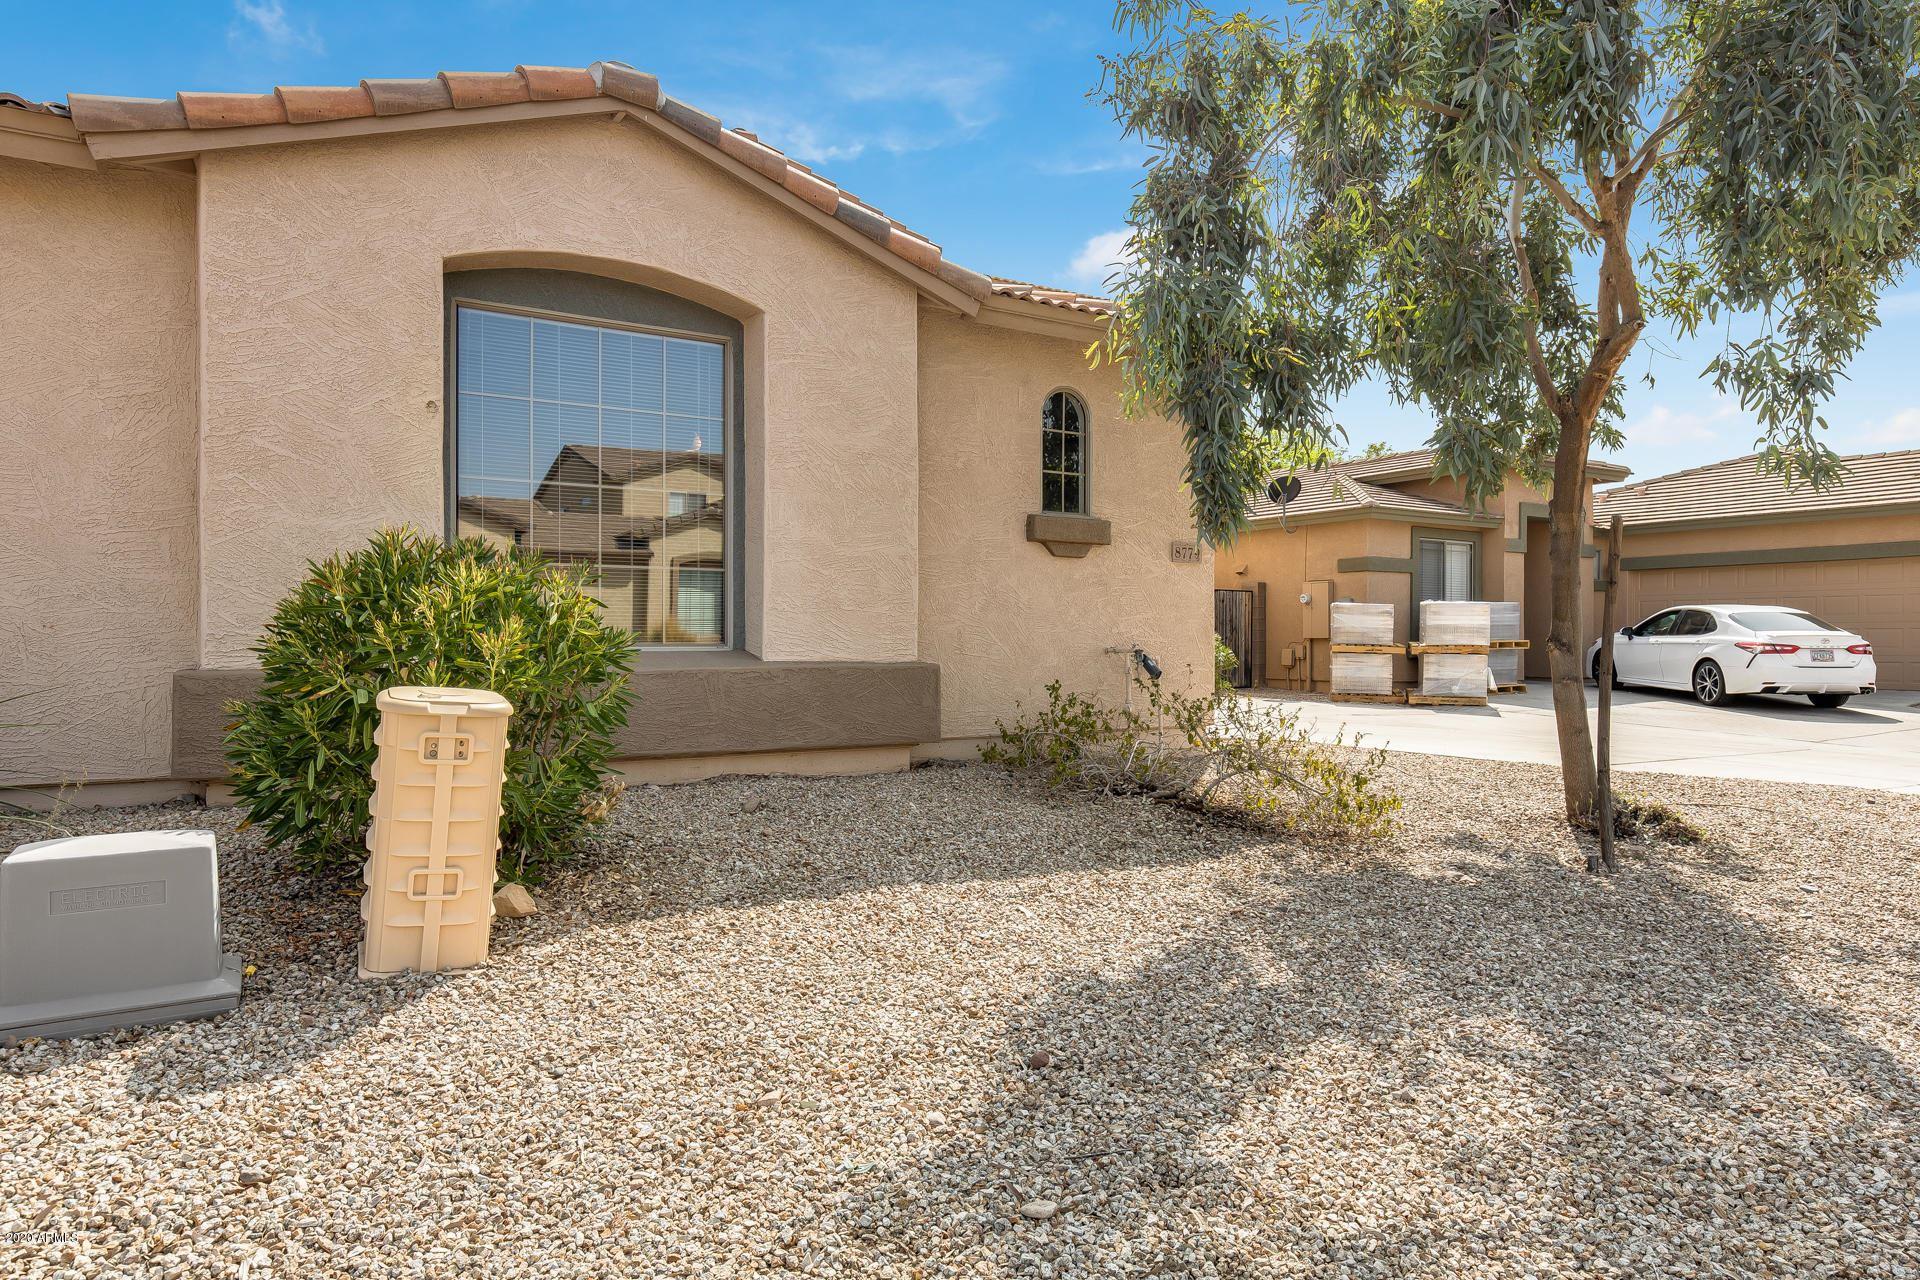 8779 W WINDSOR Drive, Peoria, AZ 85381 - MLS#: 6134376